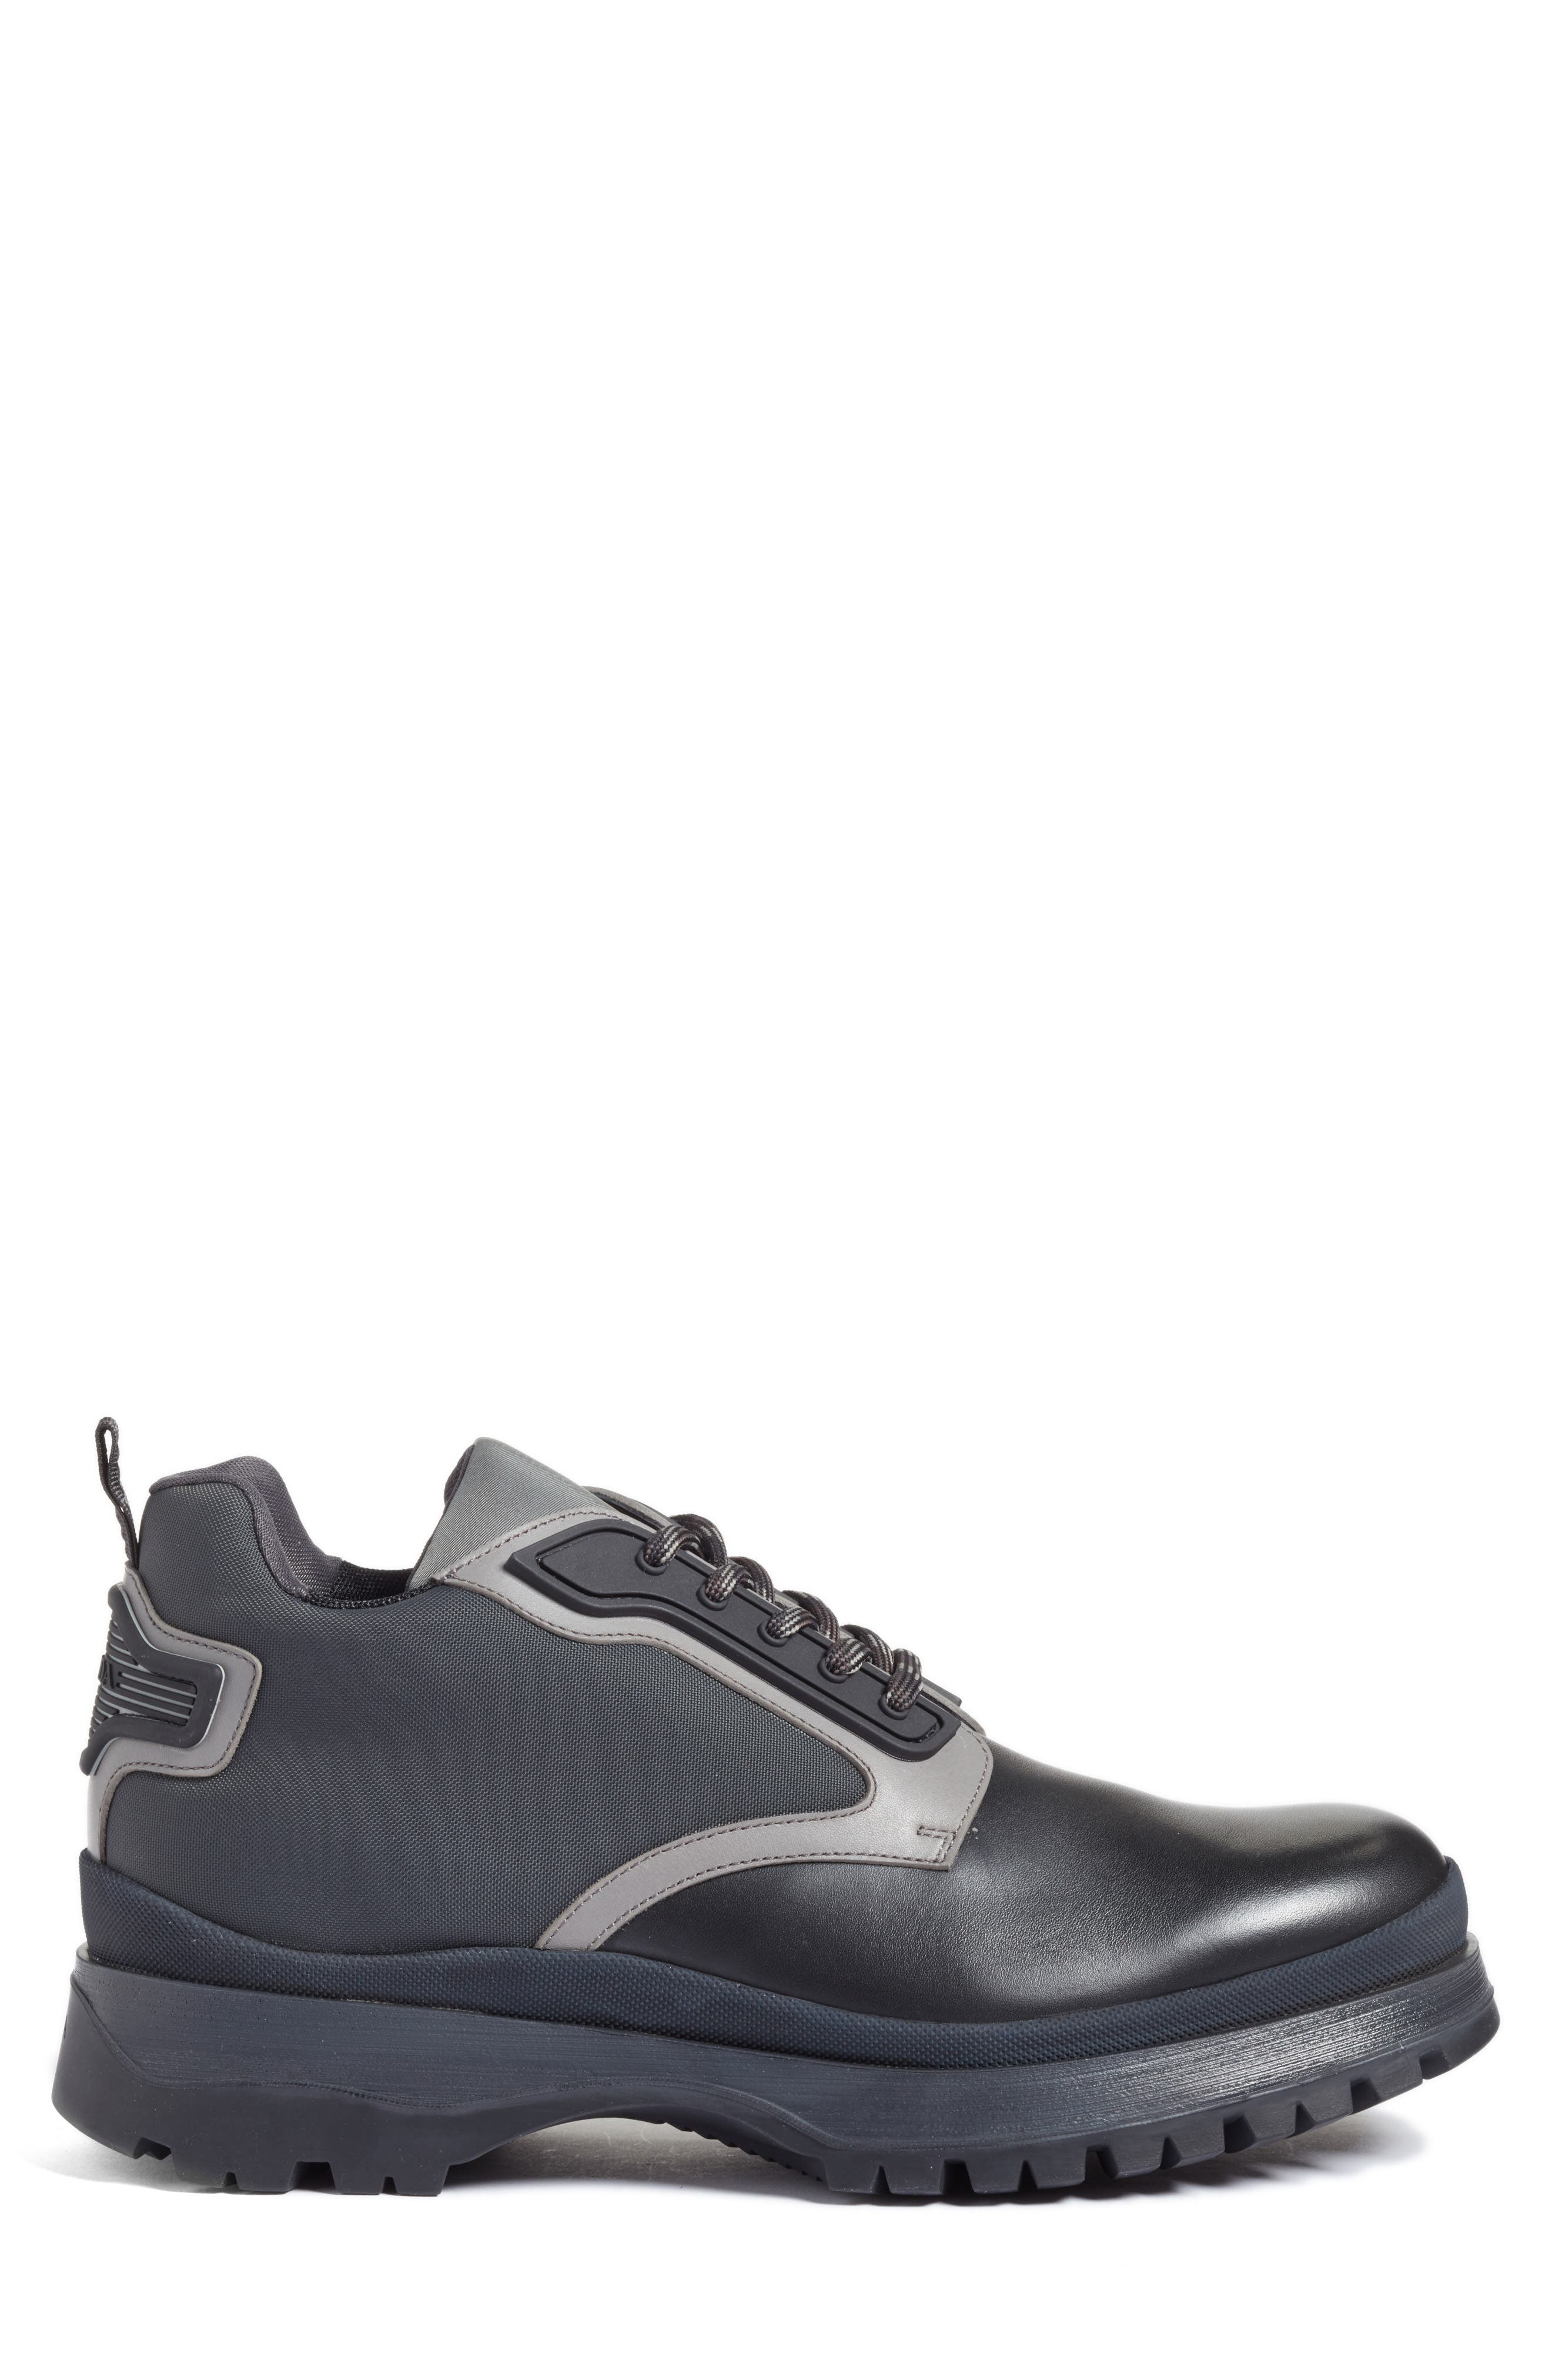 Alternate Image 3  - Prada Linea Rossa Tech Sneaker Boot (Men)